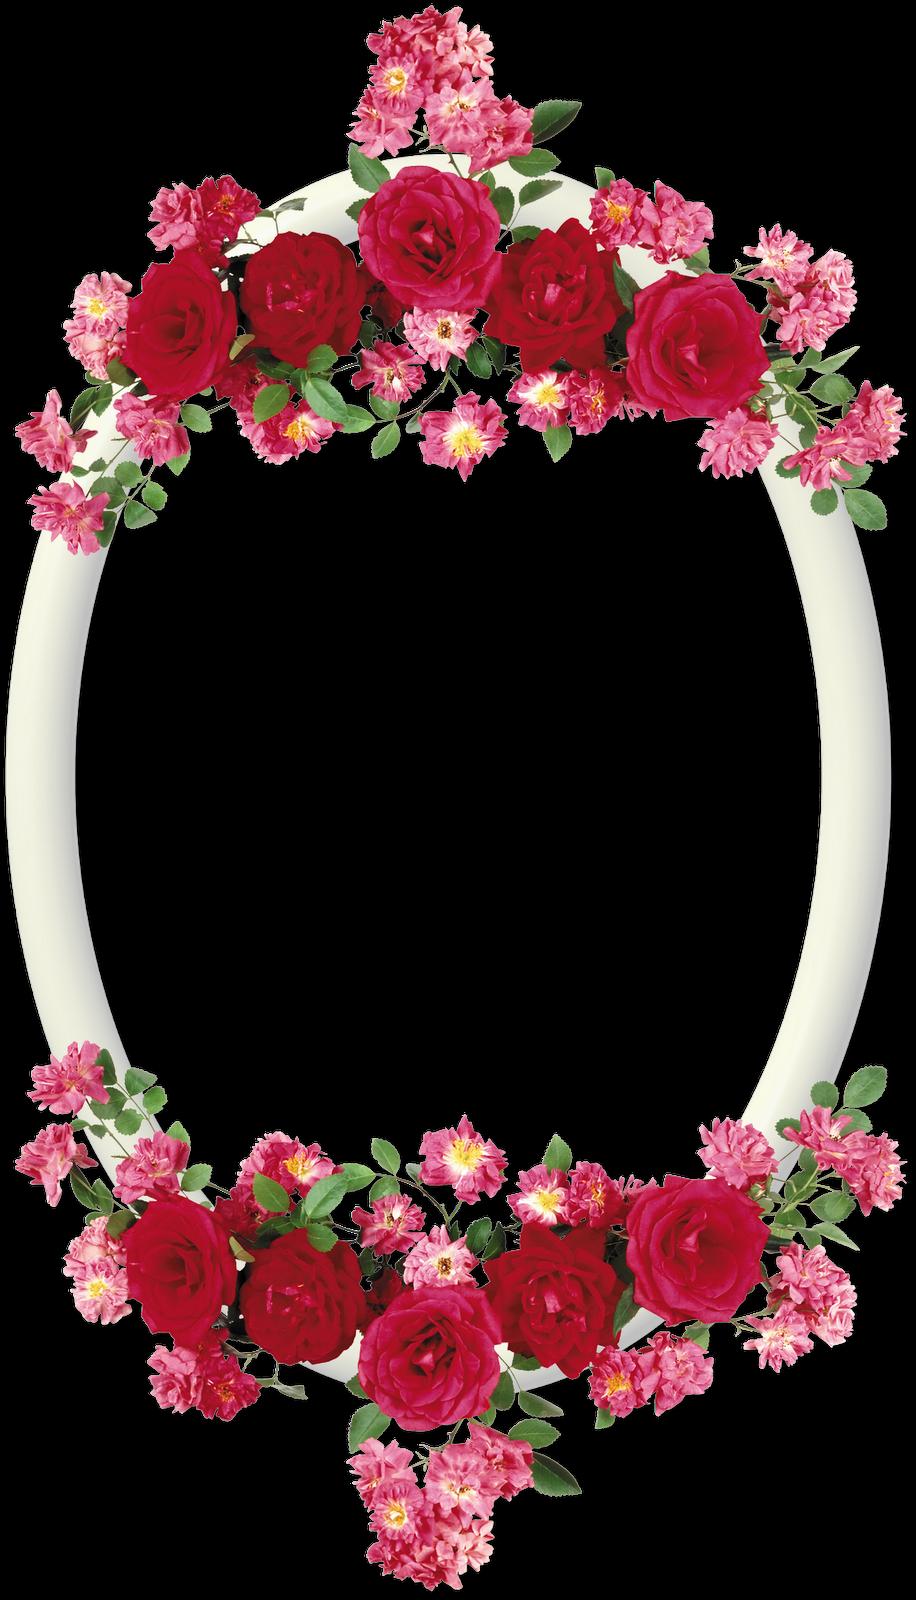 Marcos para fotos: Marcos ovalados con flores | Template:Paper and ...